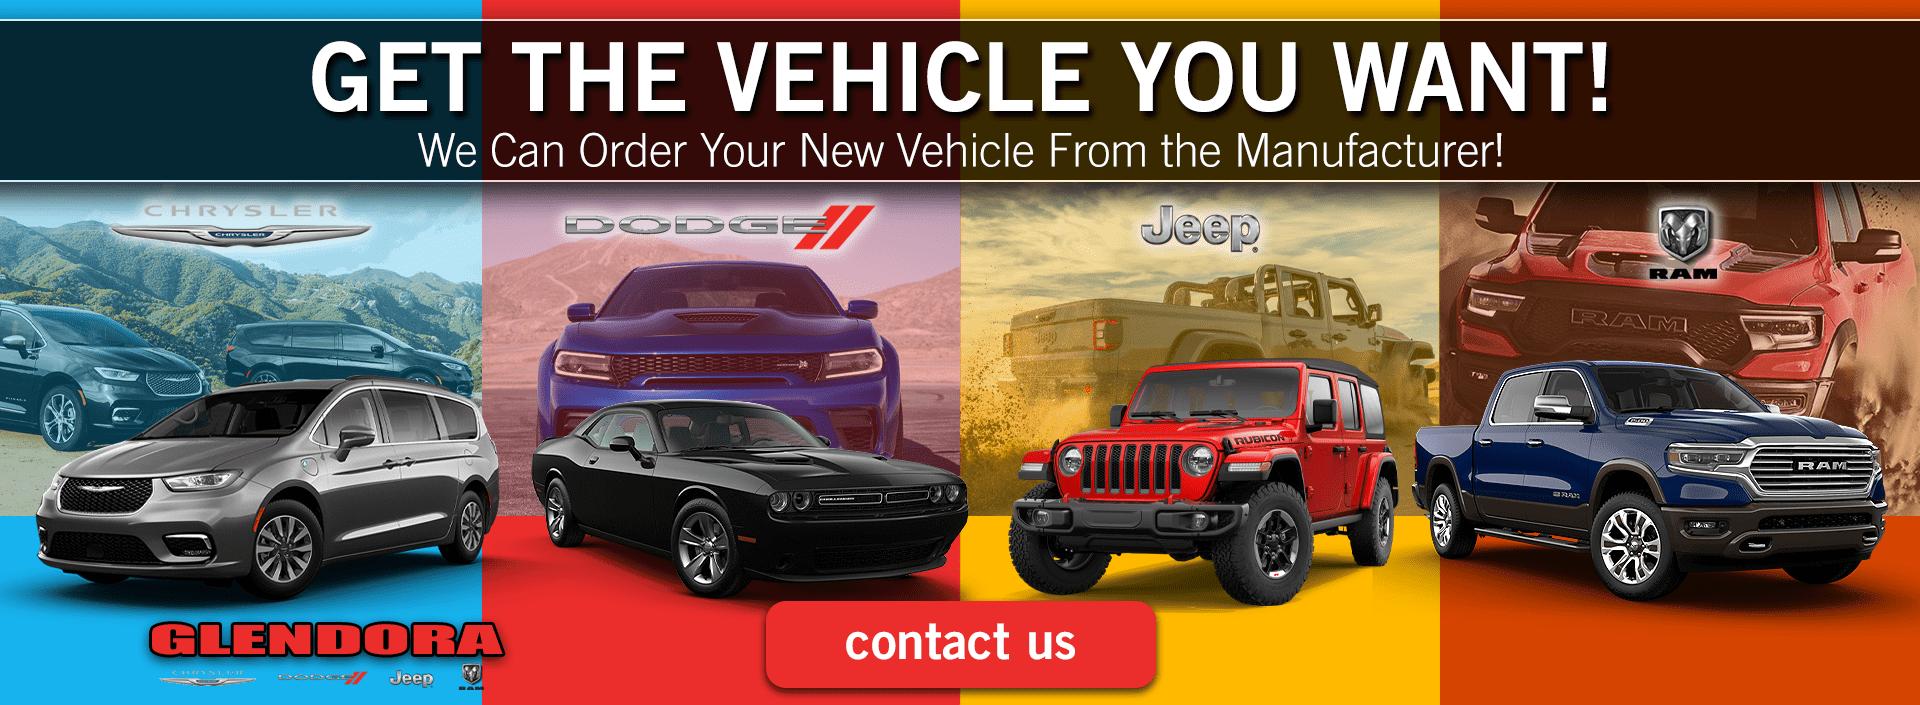 Glendora_CDJR_Order_Your_Chrysler_Dodge_Jeep_Ram